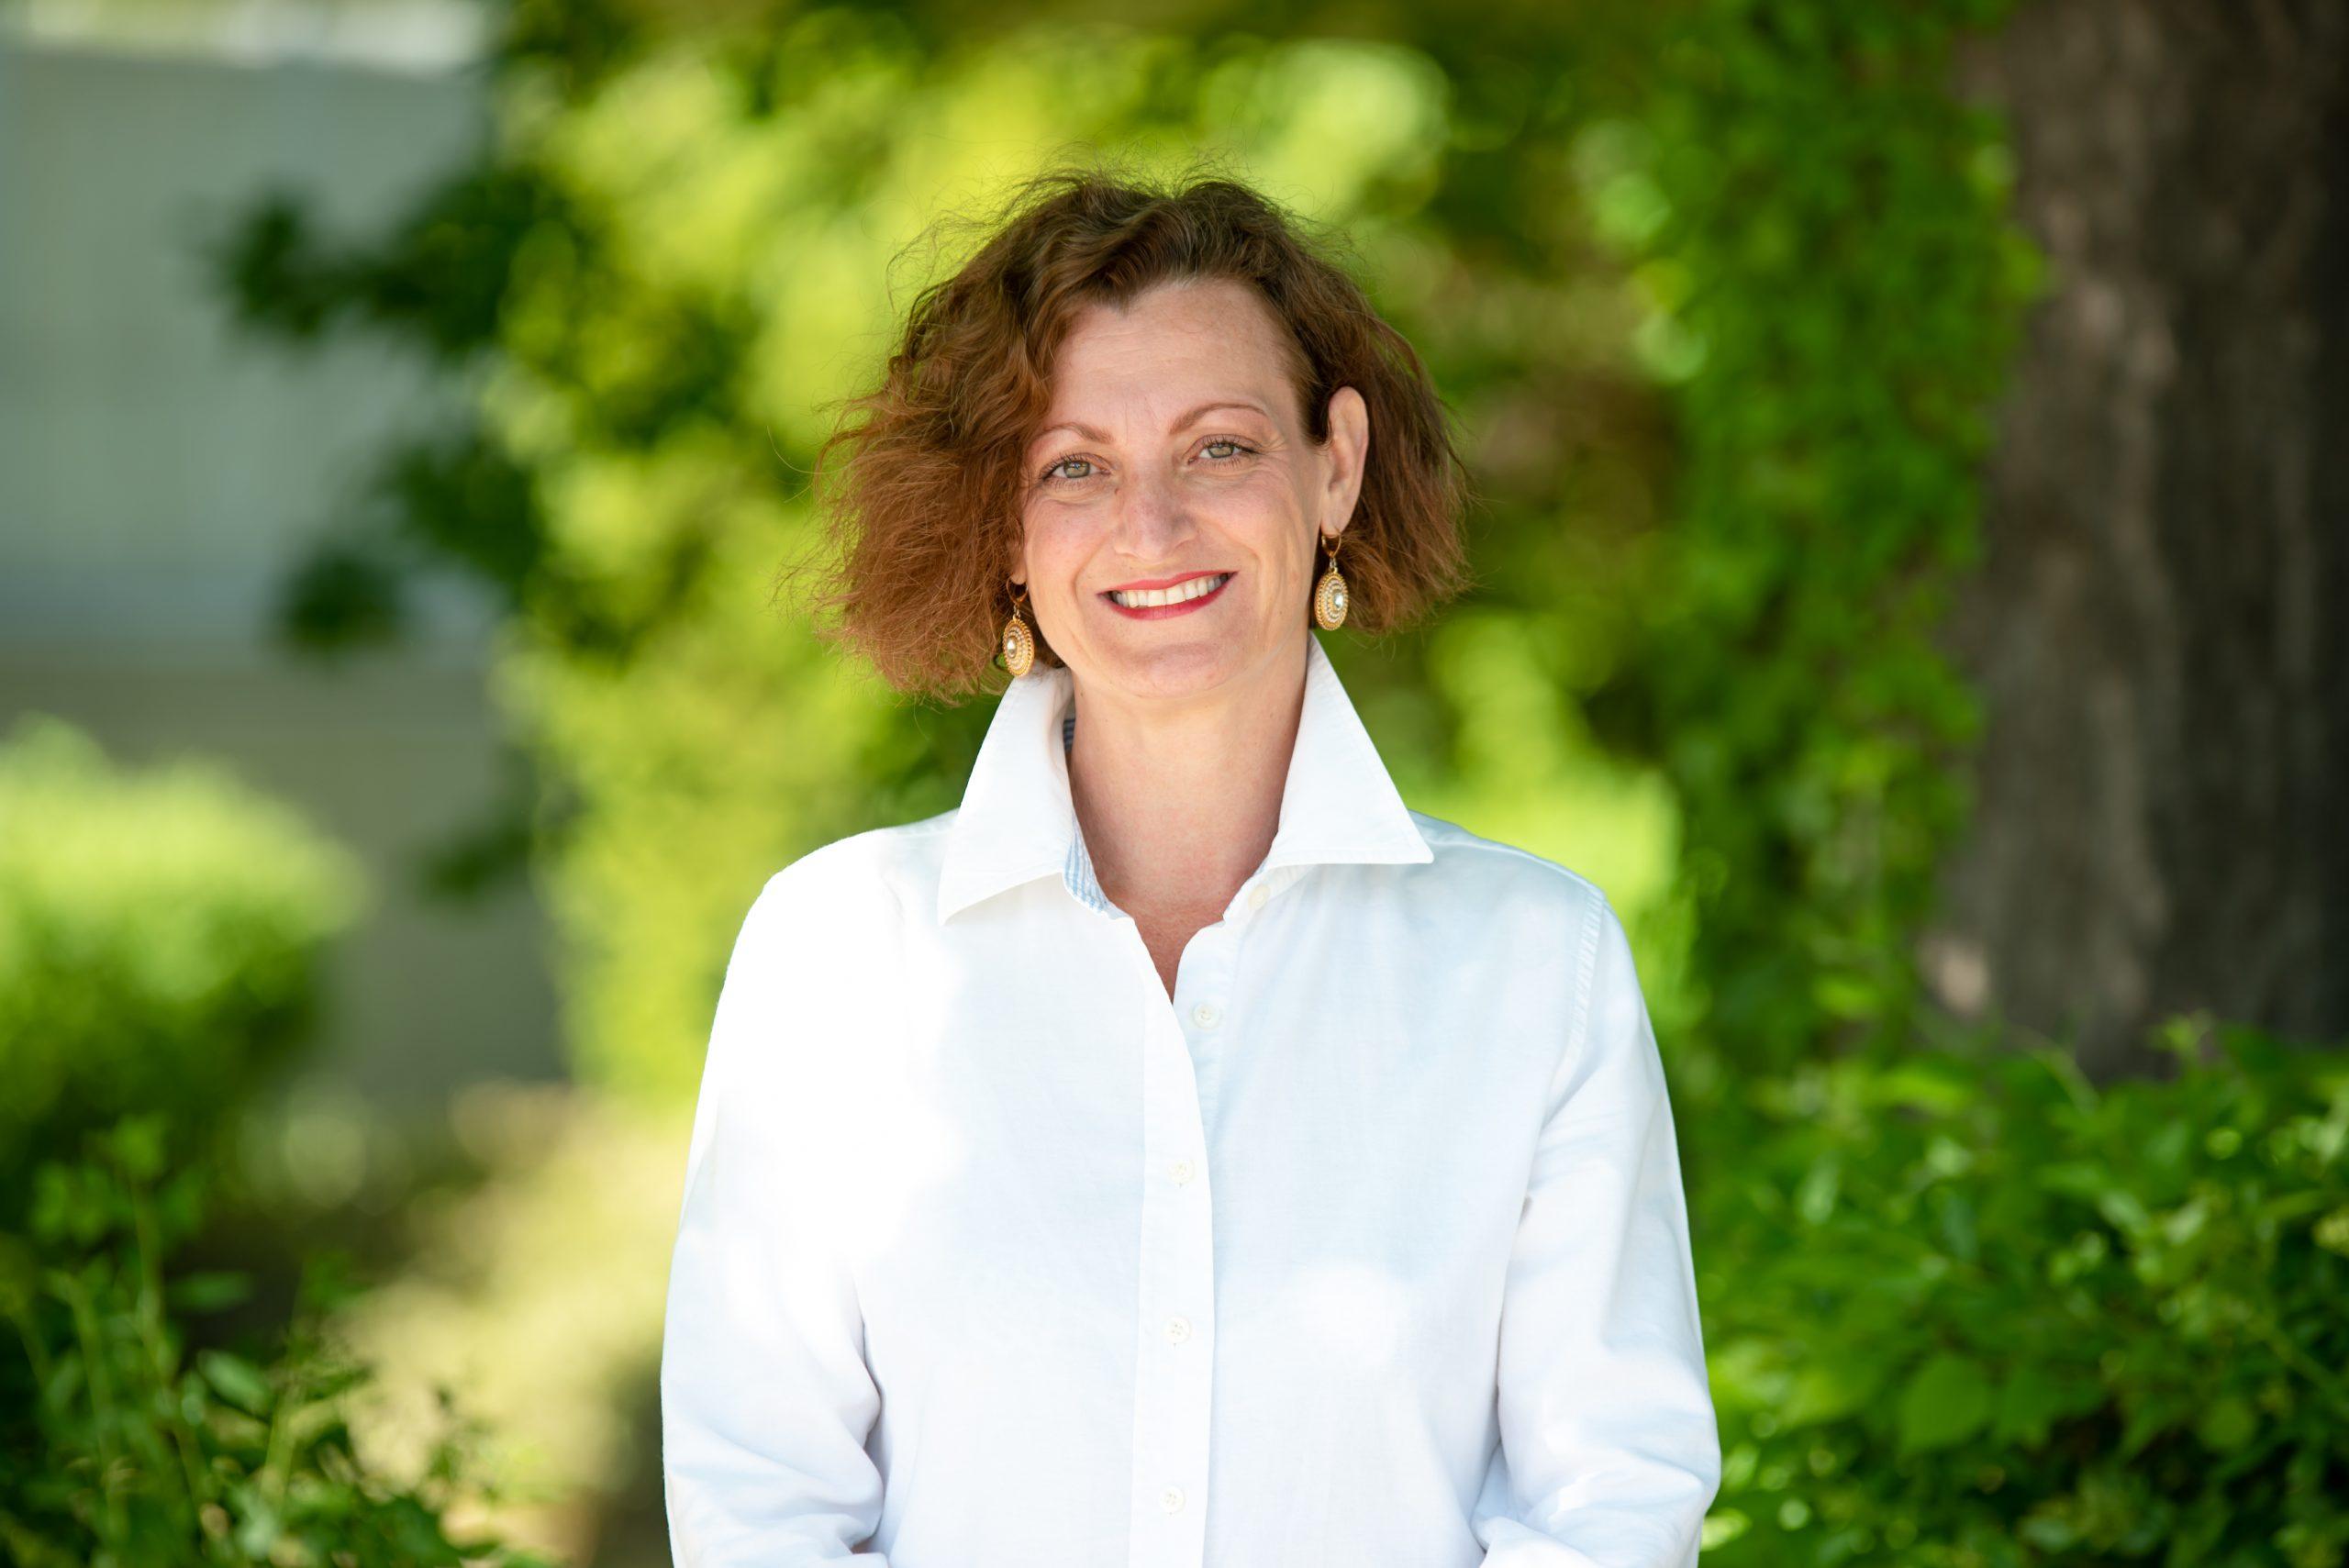 Sabine Schlögl